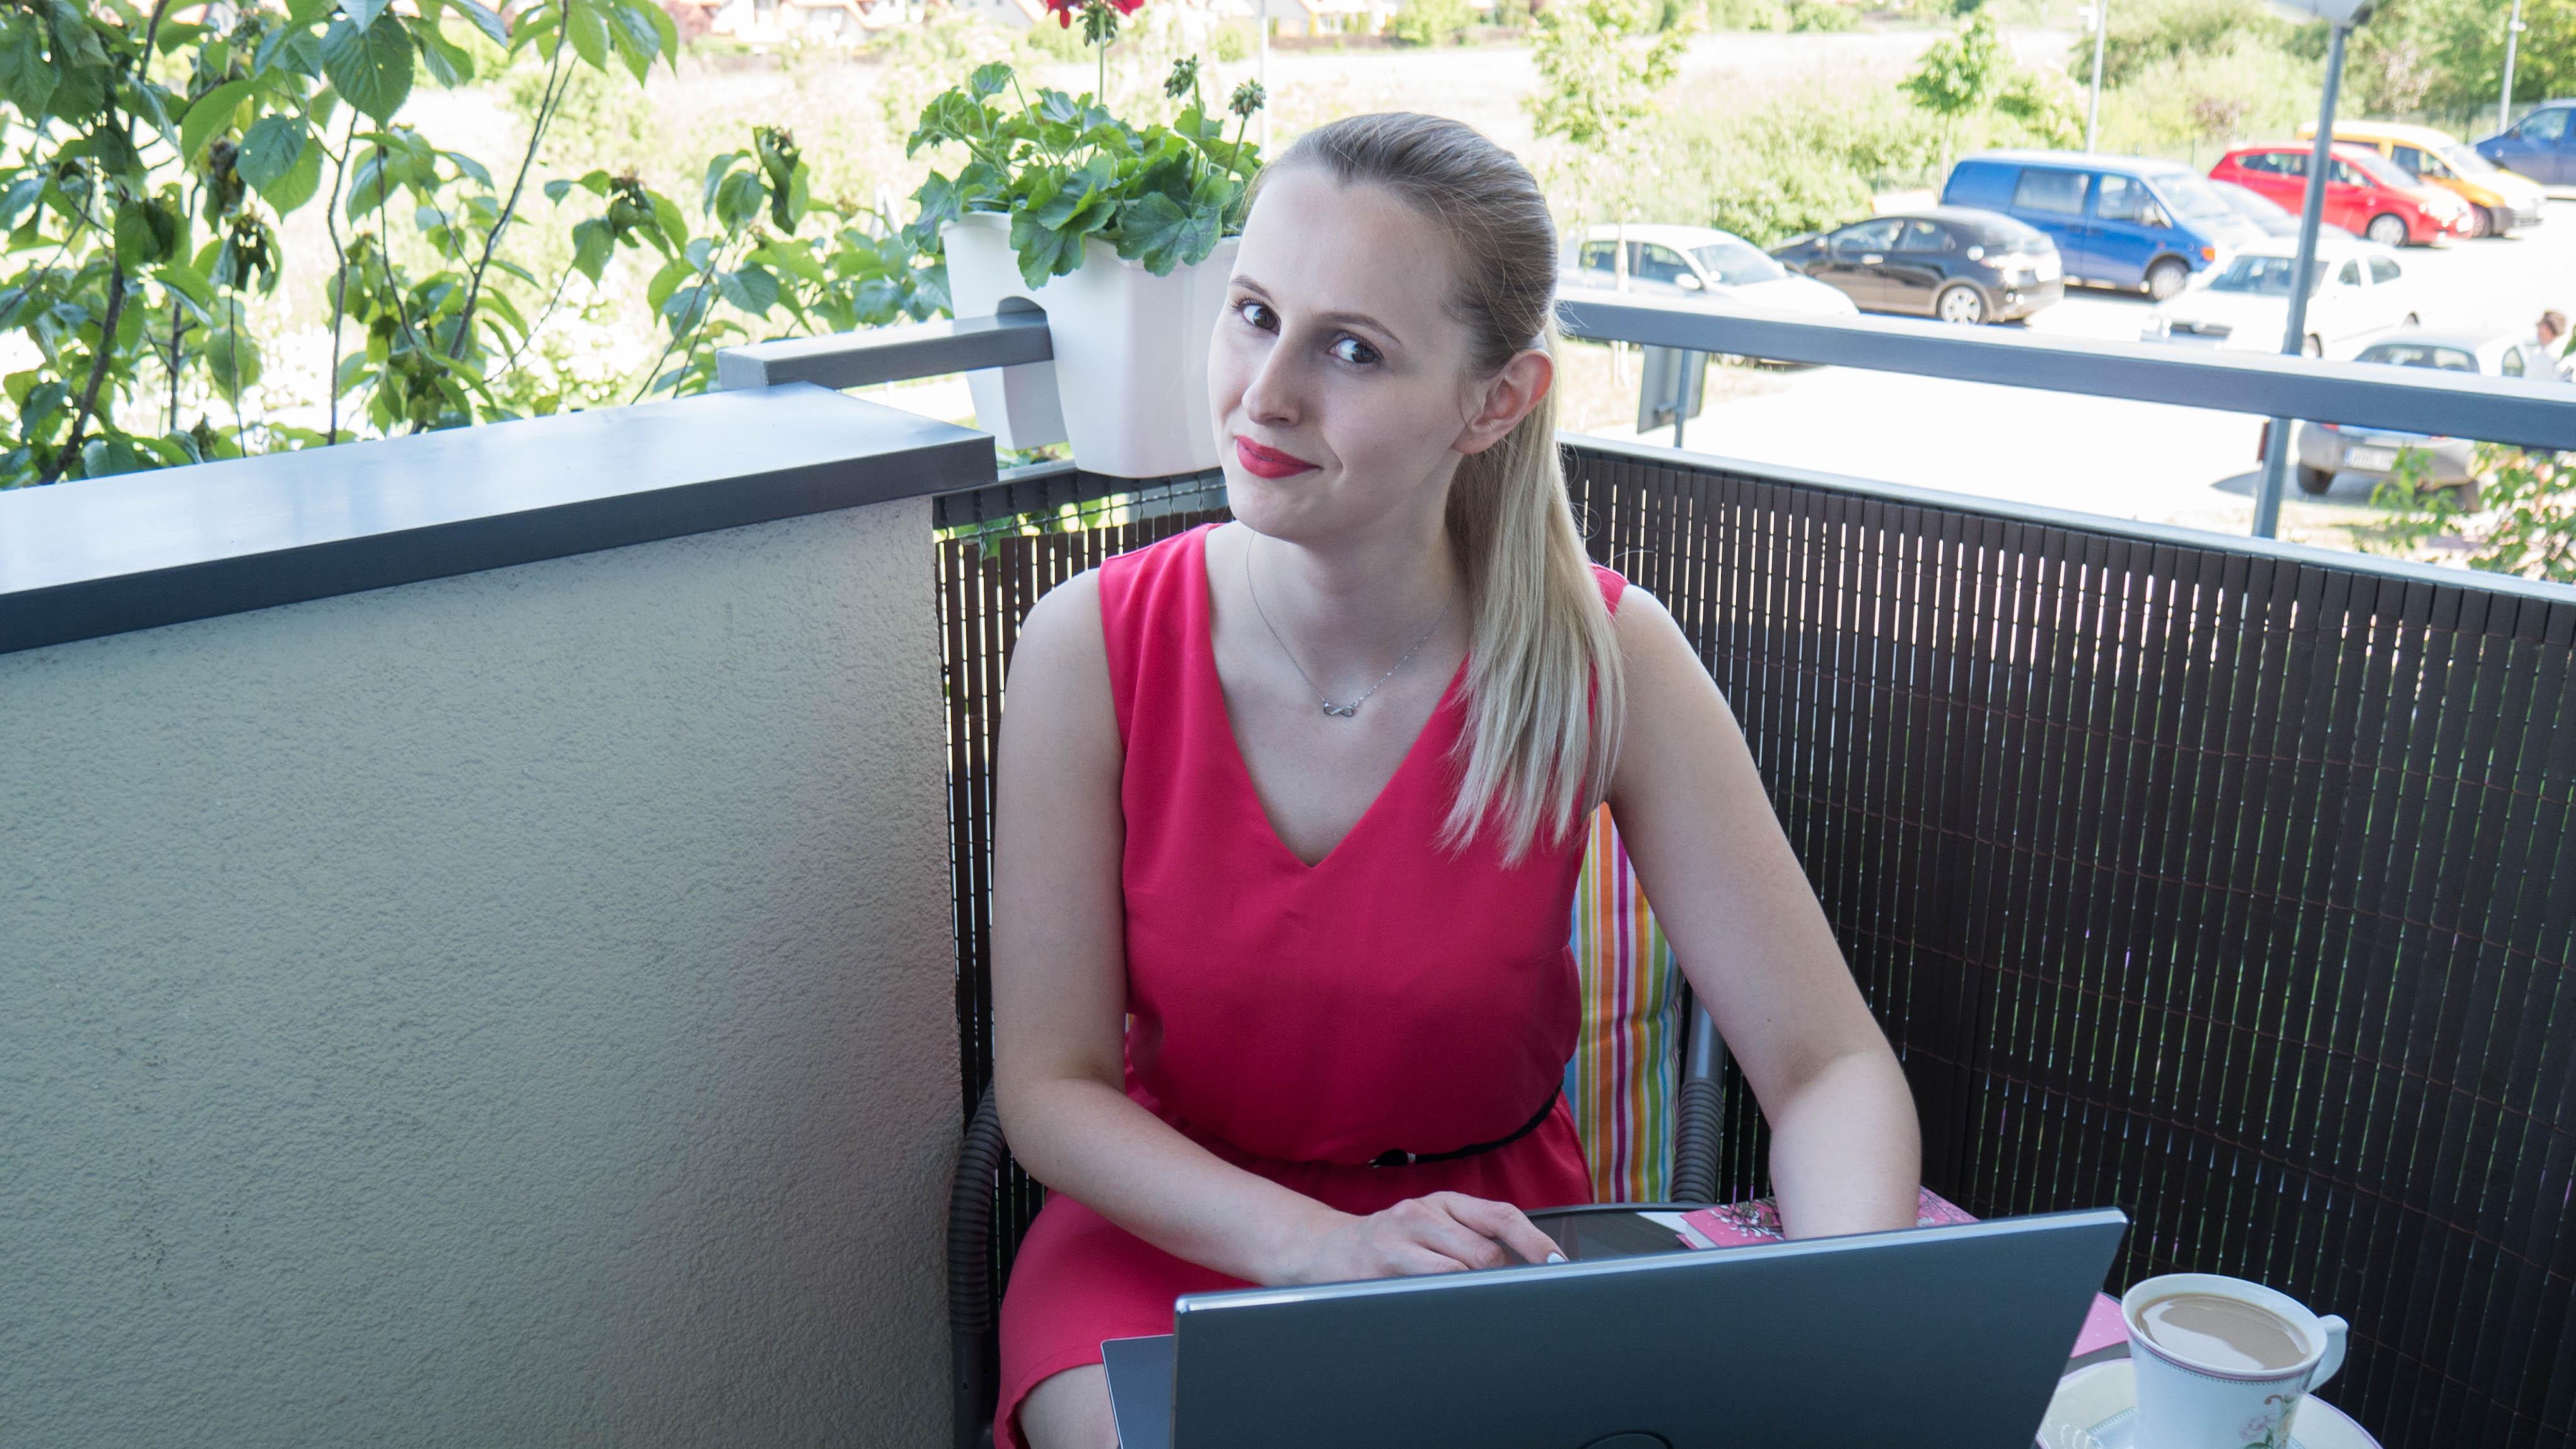 Cechy kobiety z klasą - Get the life Aleksandra Pakuła